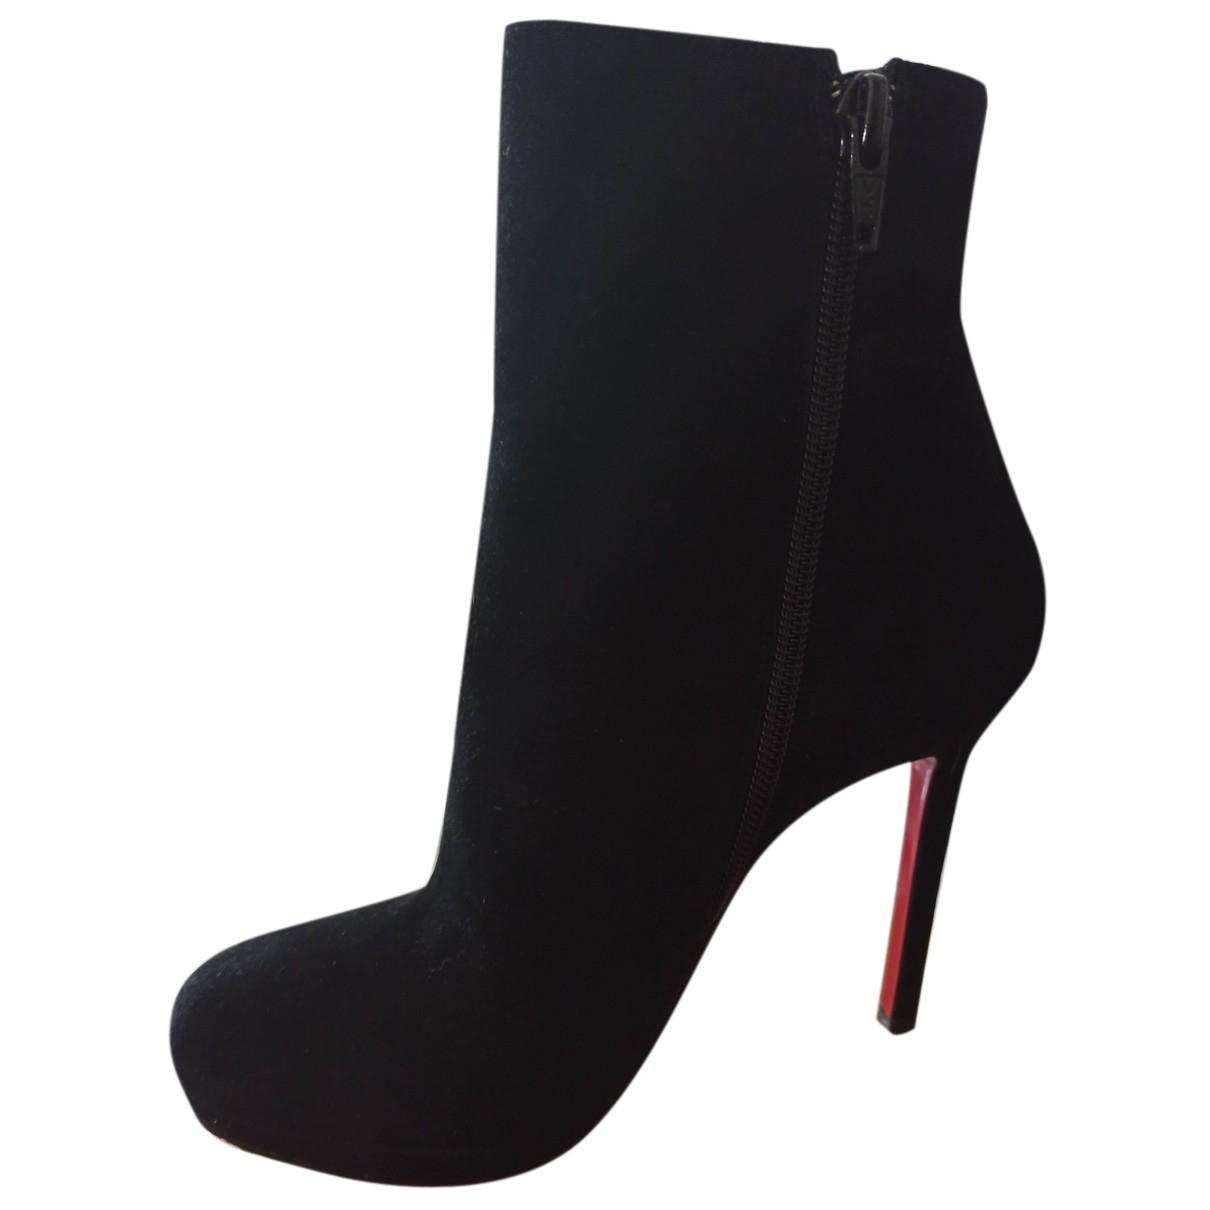 Christian Louboutin N Black Pony-style calfskin Boots for Women 36.5 EU